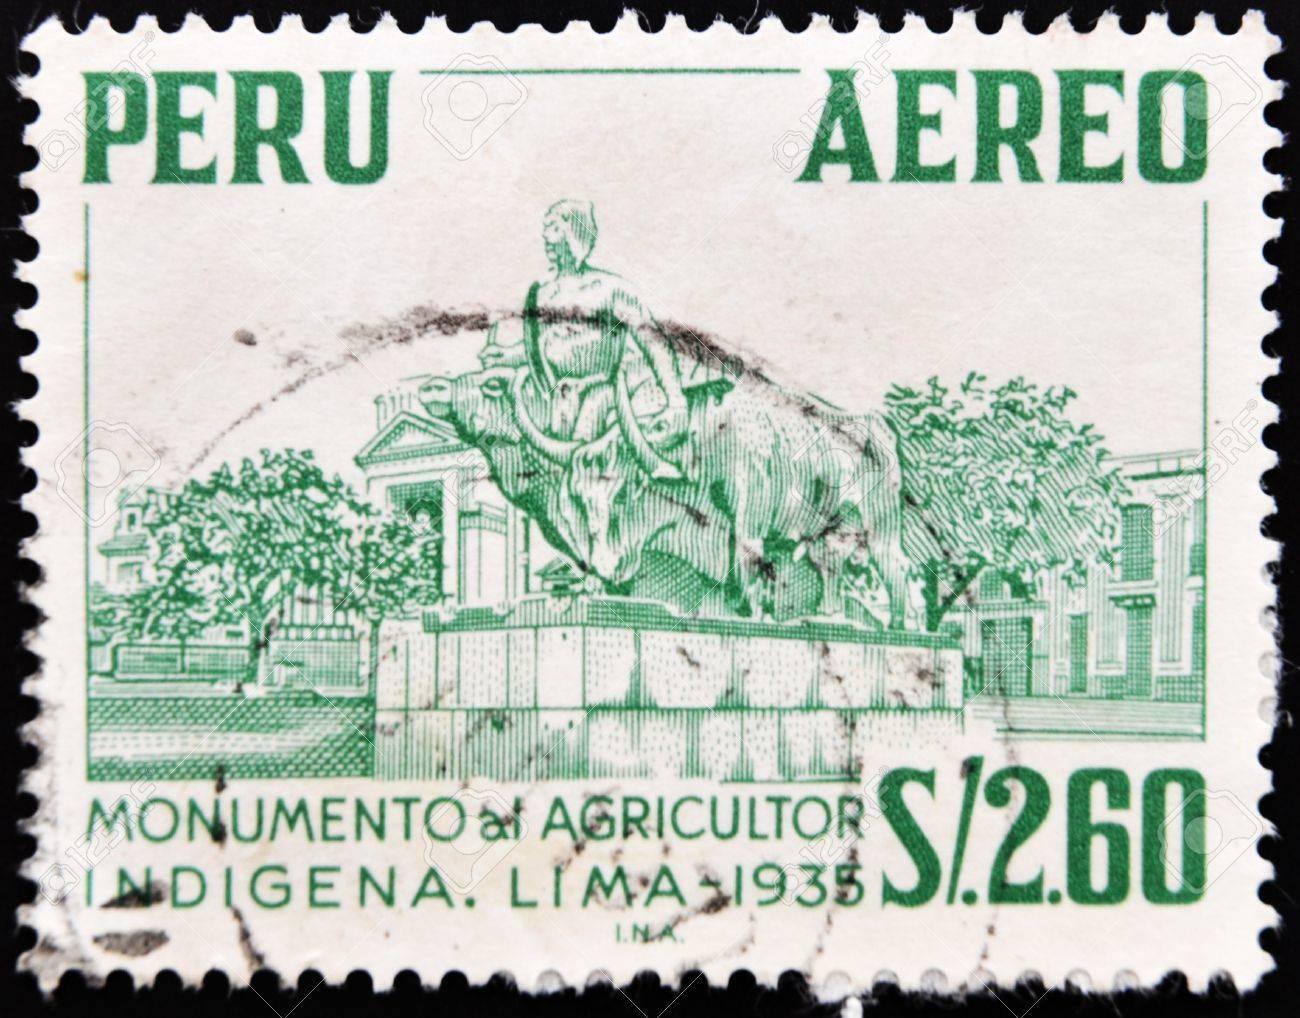 PERU - CIRCA 1935: A stamp printed in Peru shows monument to the indigenous farmer, circa 1935 Stock Photo - 10766487